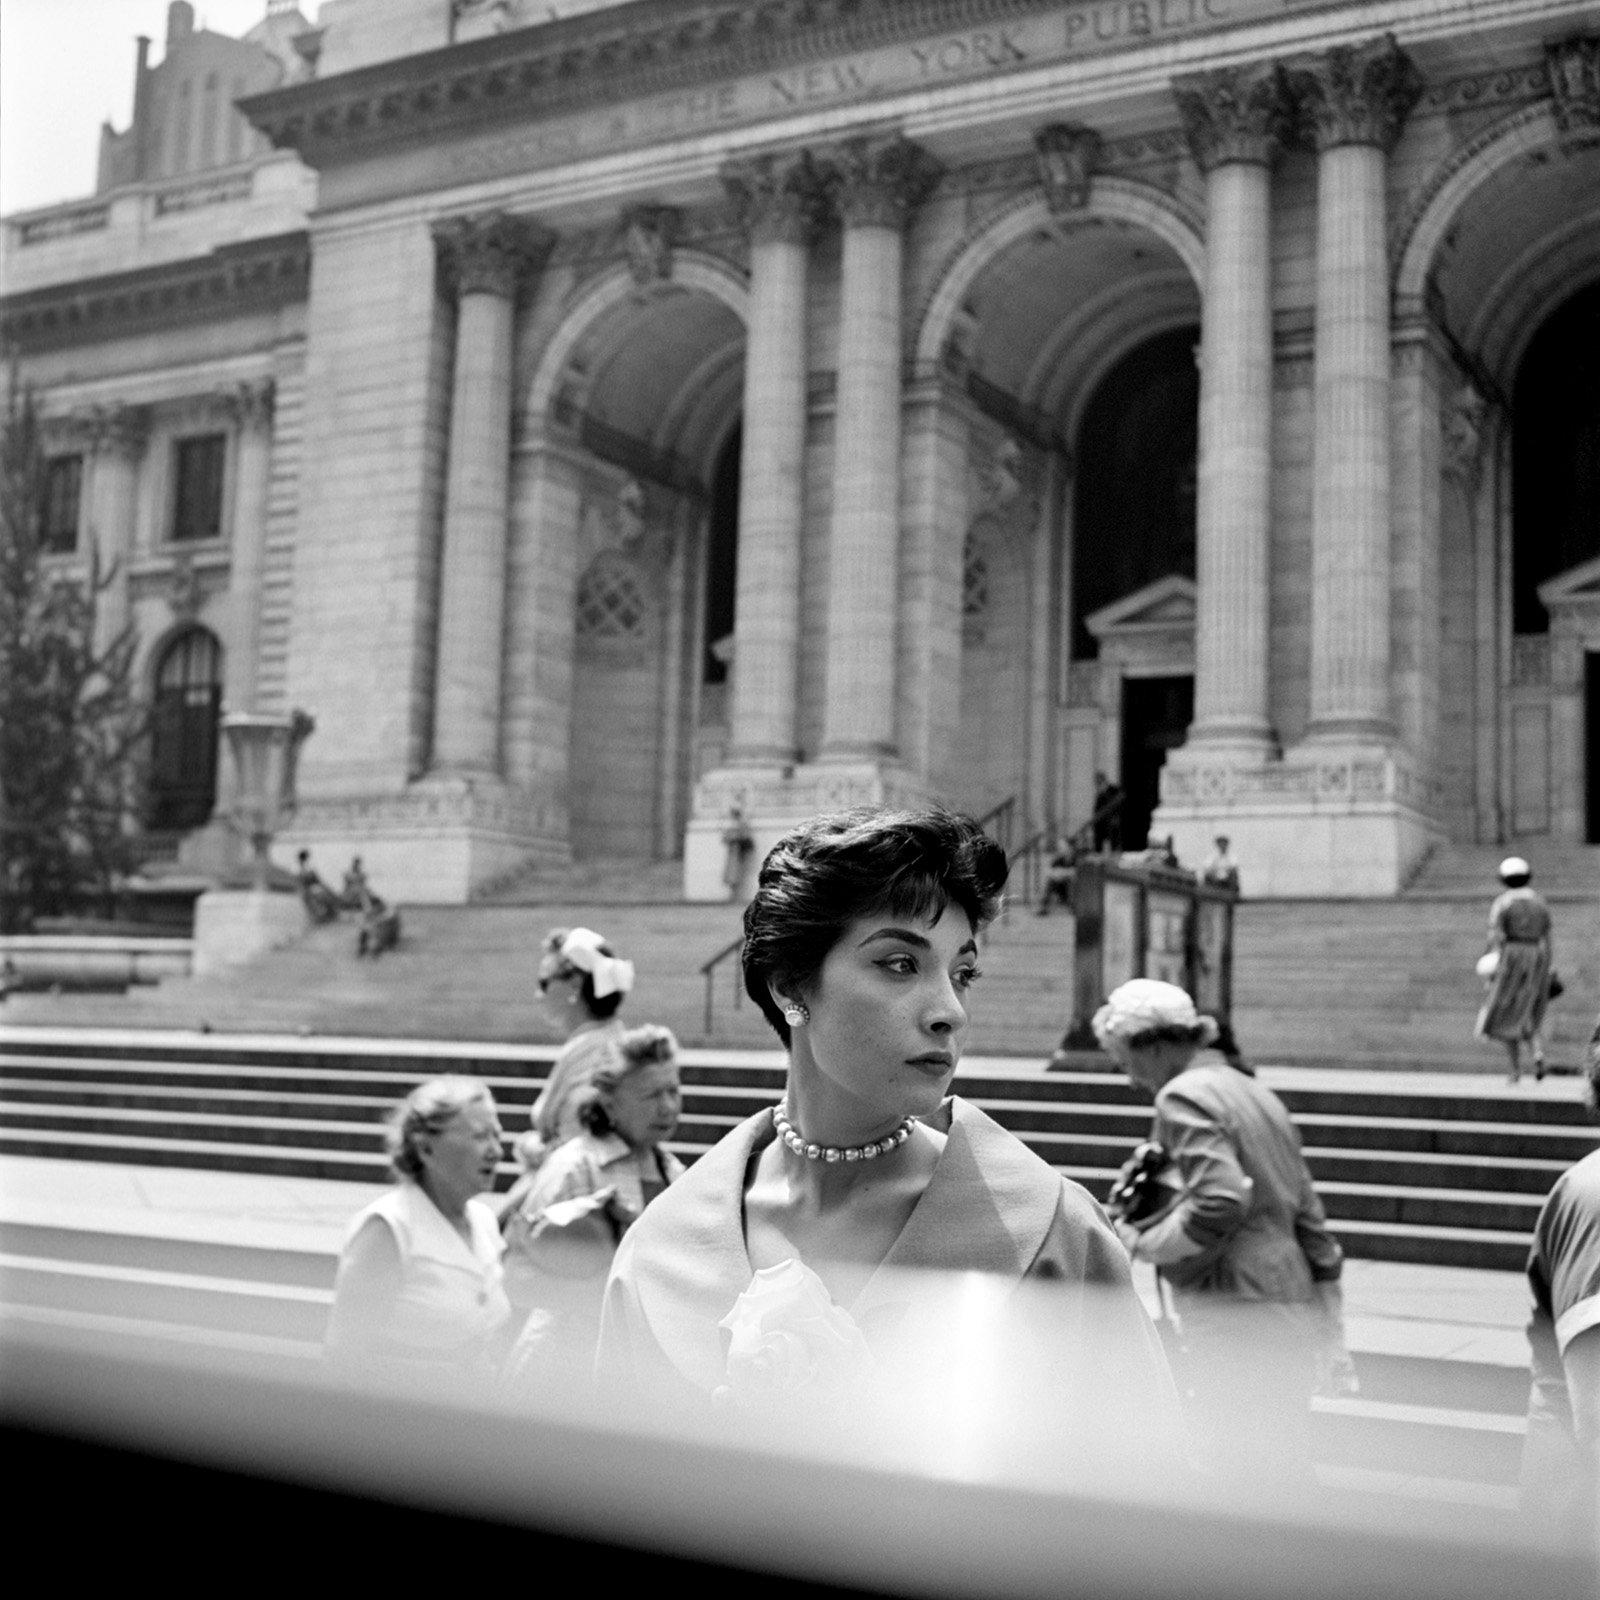 Finding Vivian Maier  © Vivian MaierCollection John Maloof Courtesy Howard Greenberg Gallery, New York Les Douches La Galeri